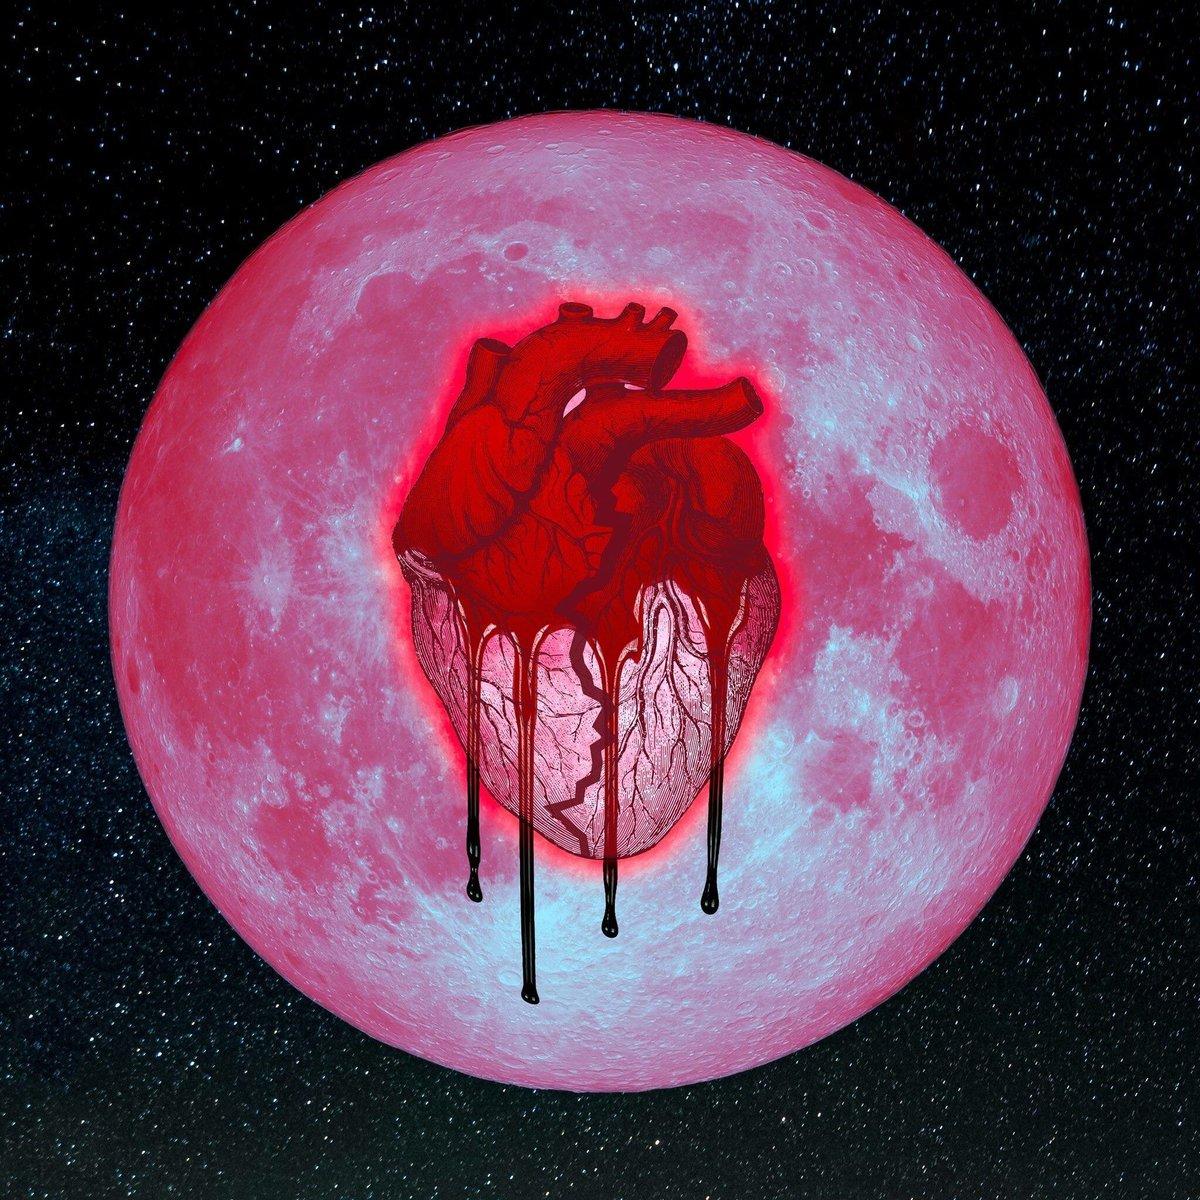 Download #HeartbreakOnAFullMoon on @AppleMusic now! https://t.co/DSgT1oHFQG https://t.co/zdagvHbMm9